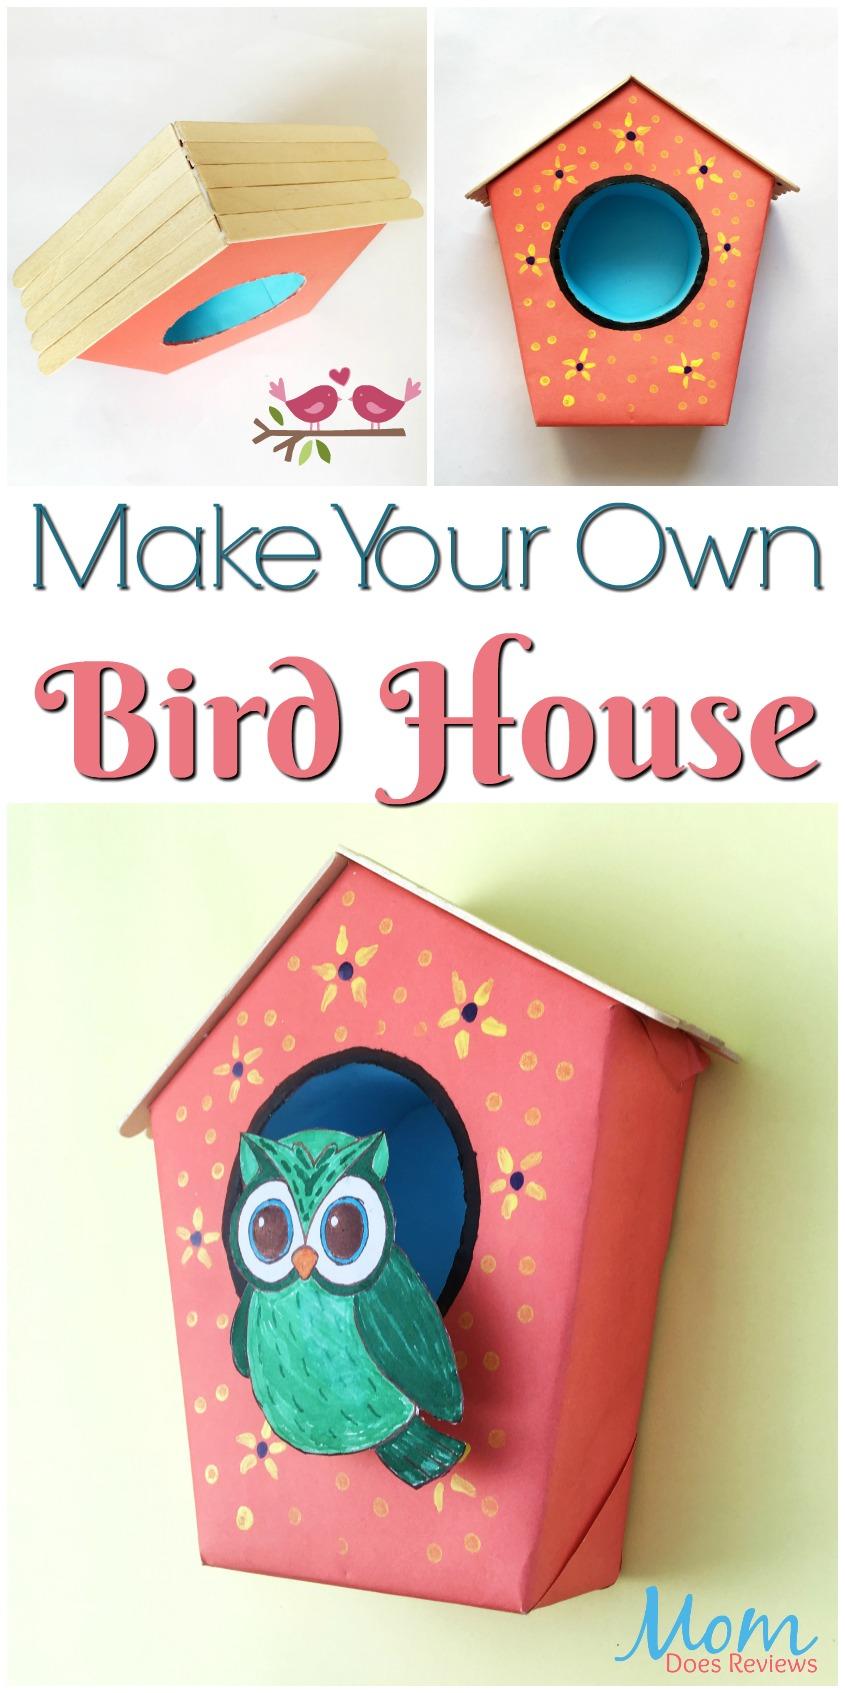 Make your Own Bird House #Craft! #DIY #easycrafts #birdhouse